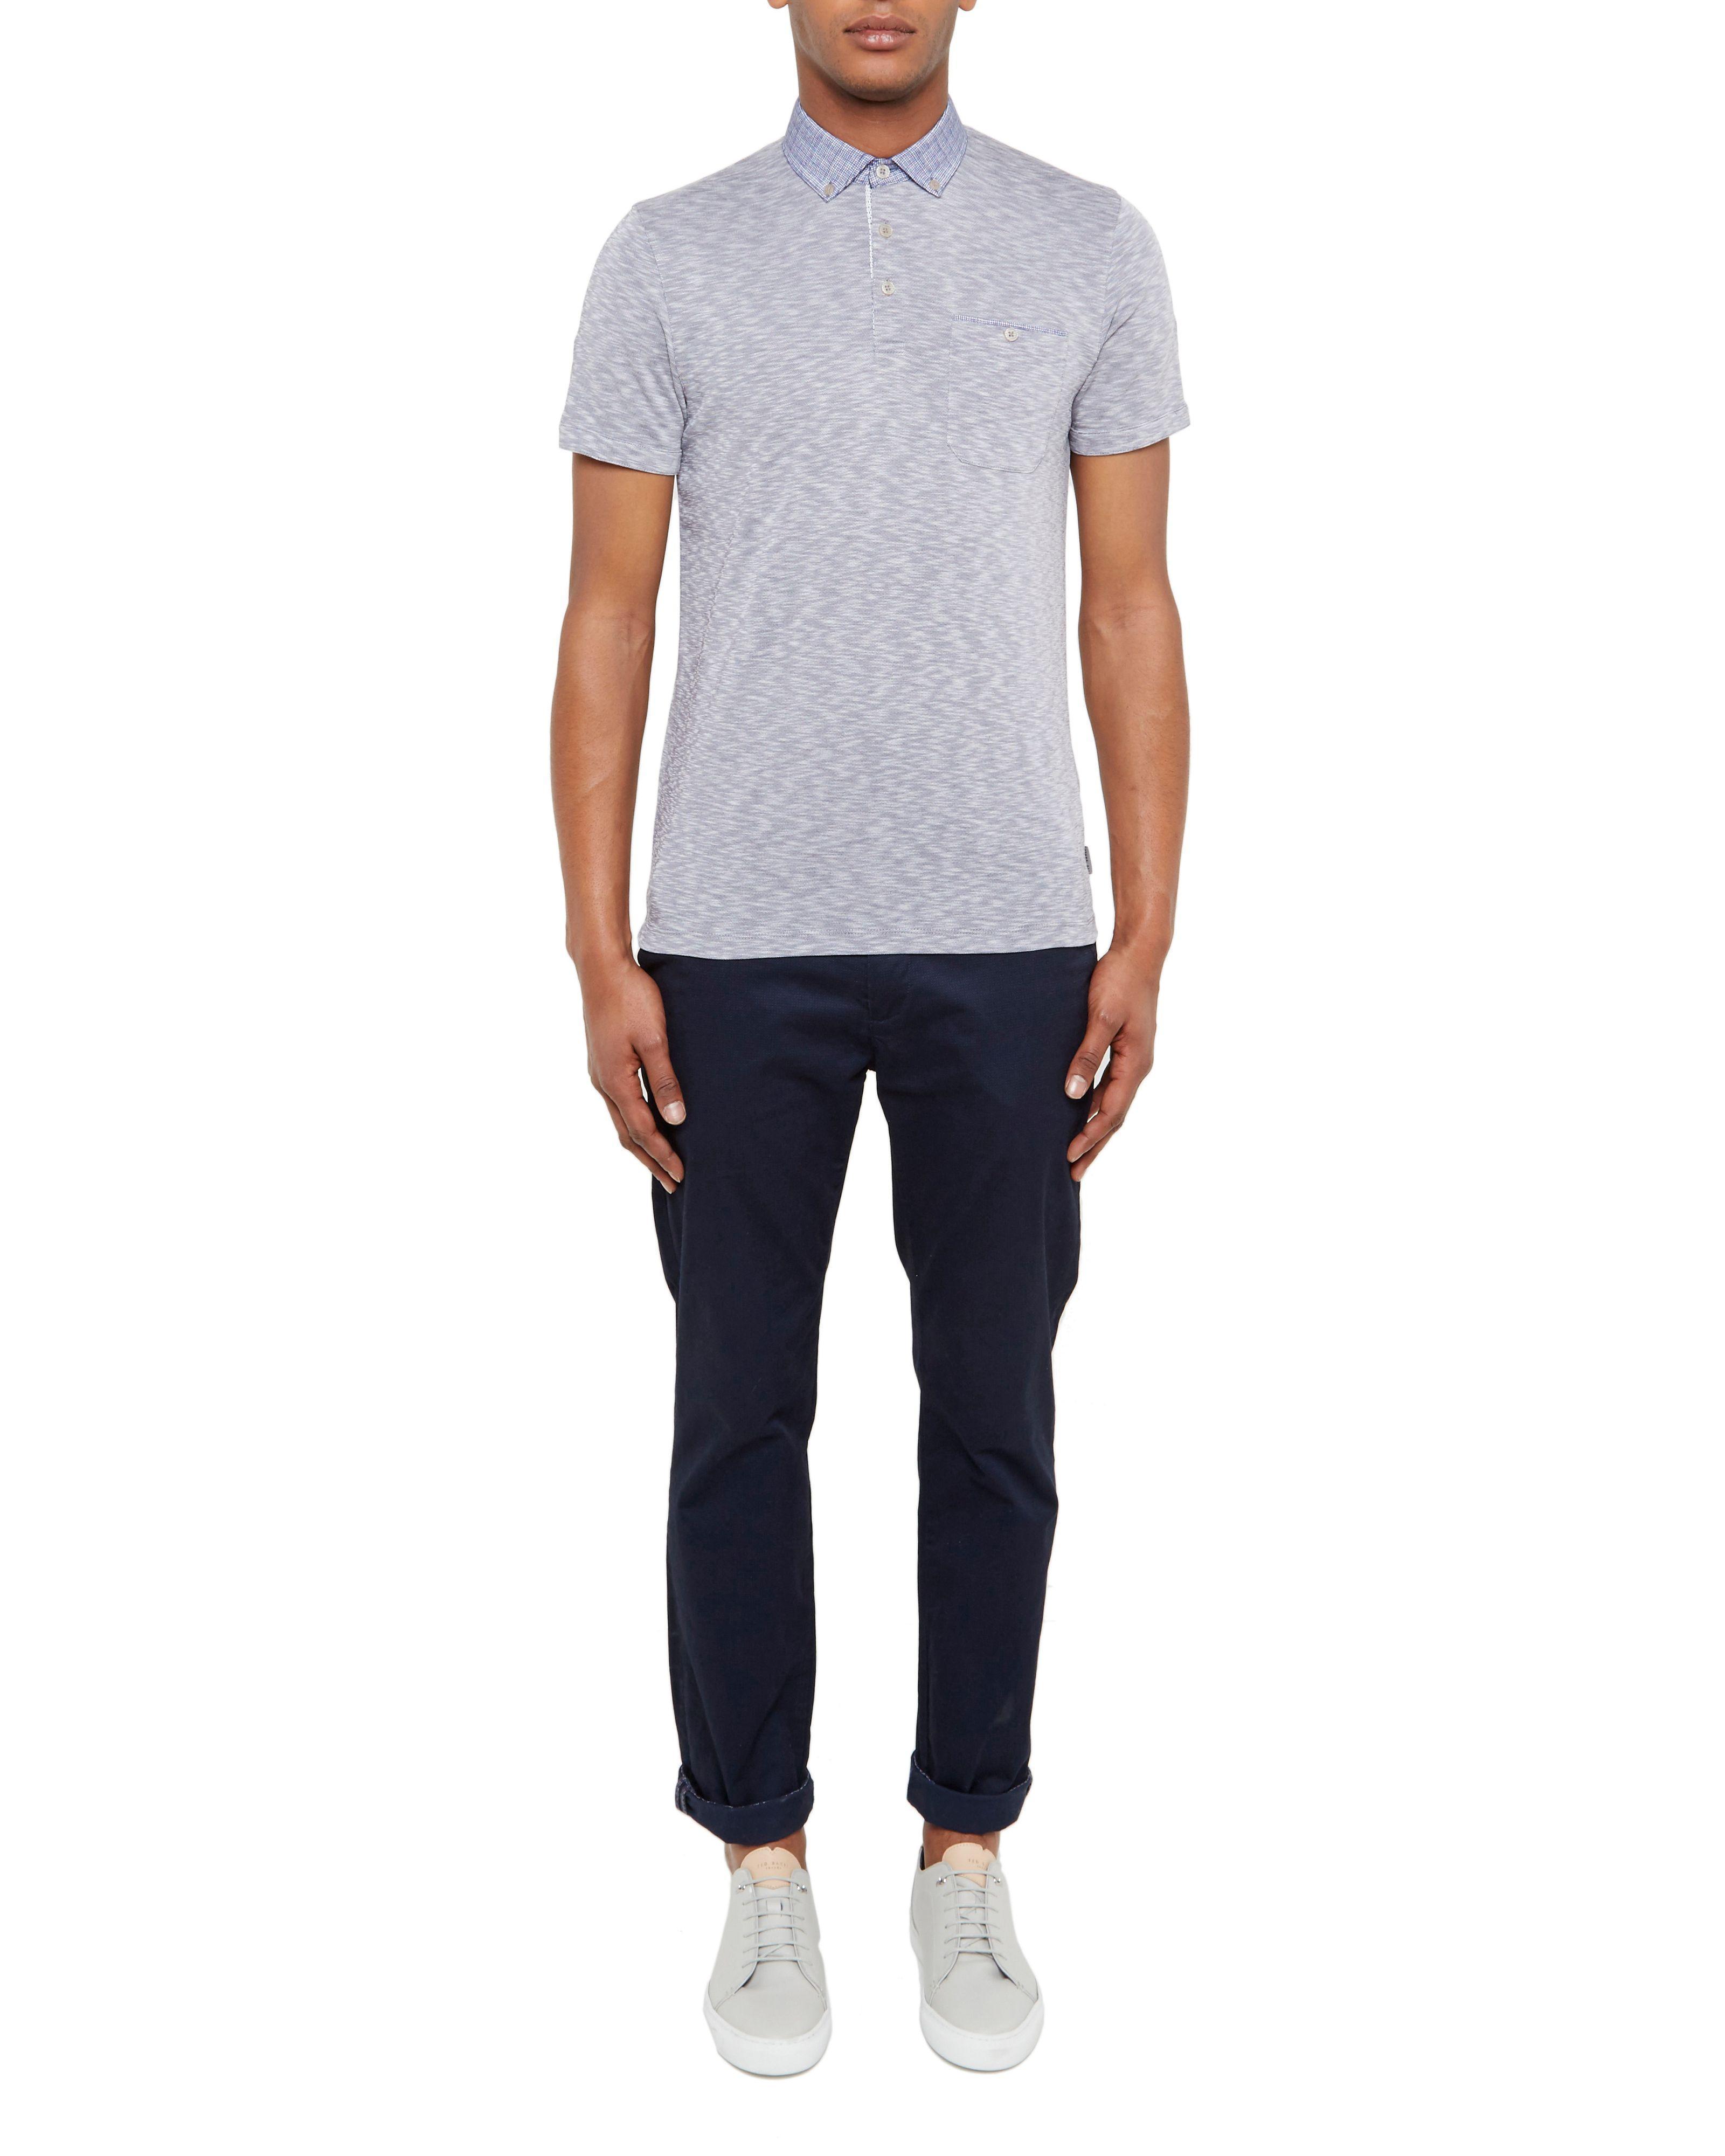 Ted Baker Synthetic Sogar Woven Collar Polo Shirt in Blue for Men